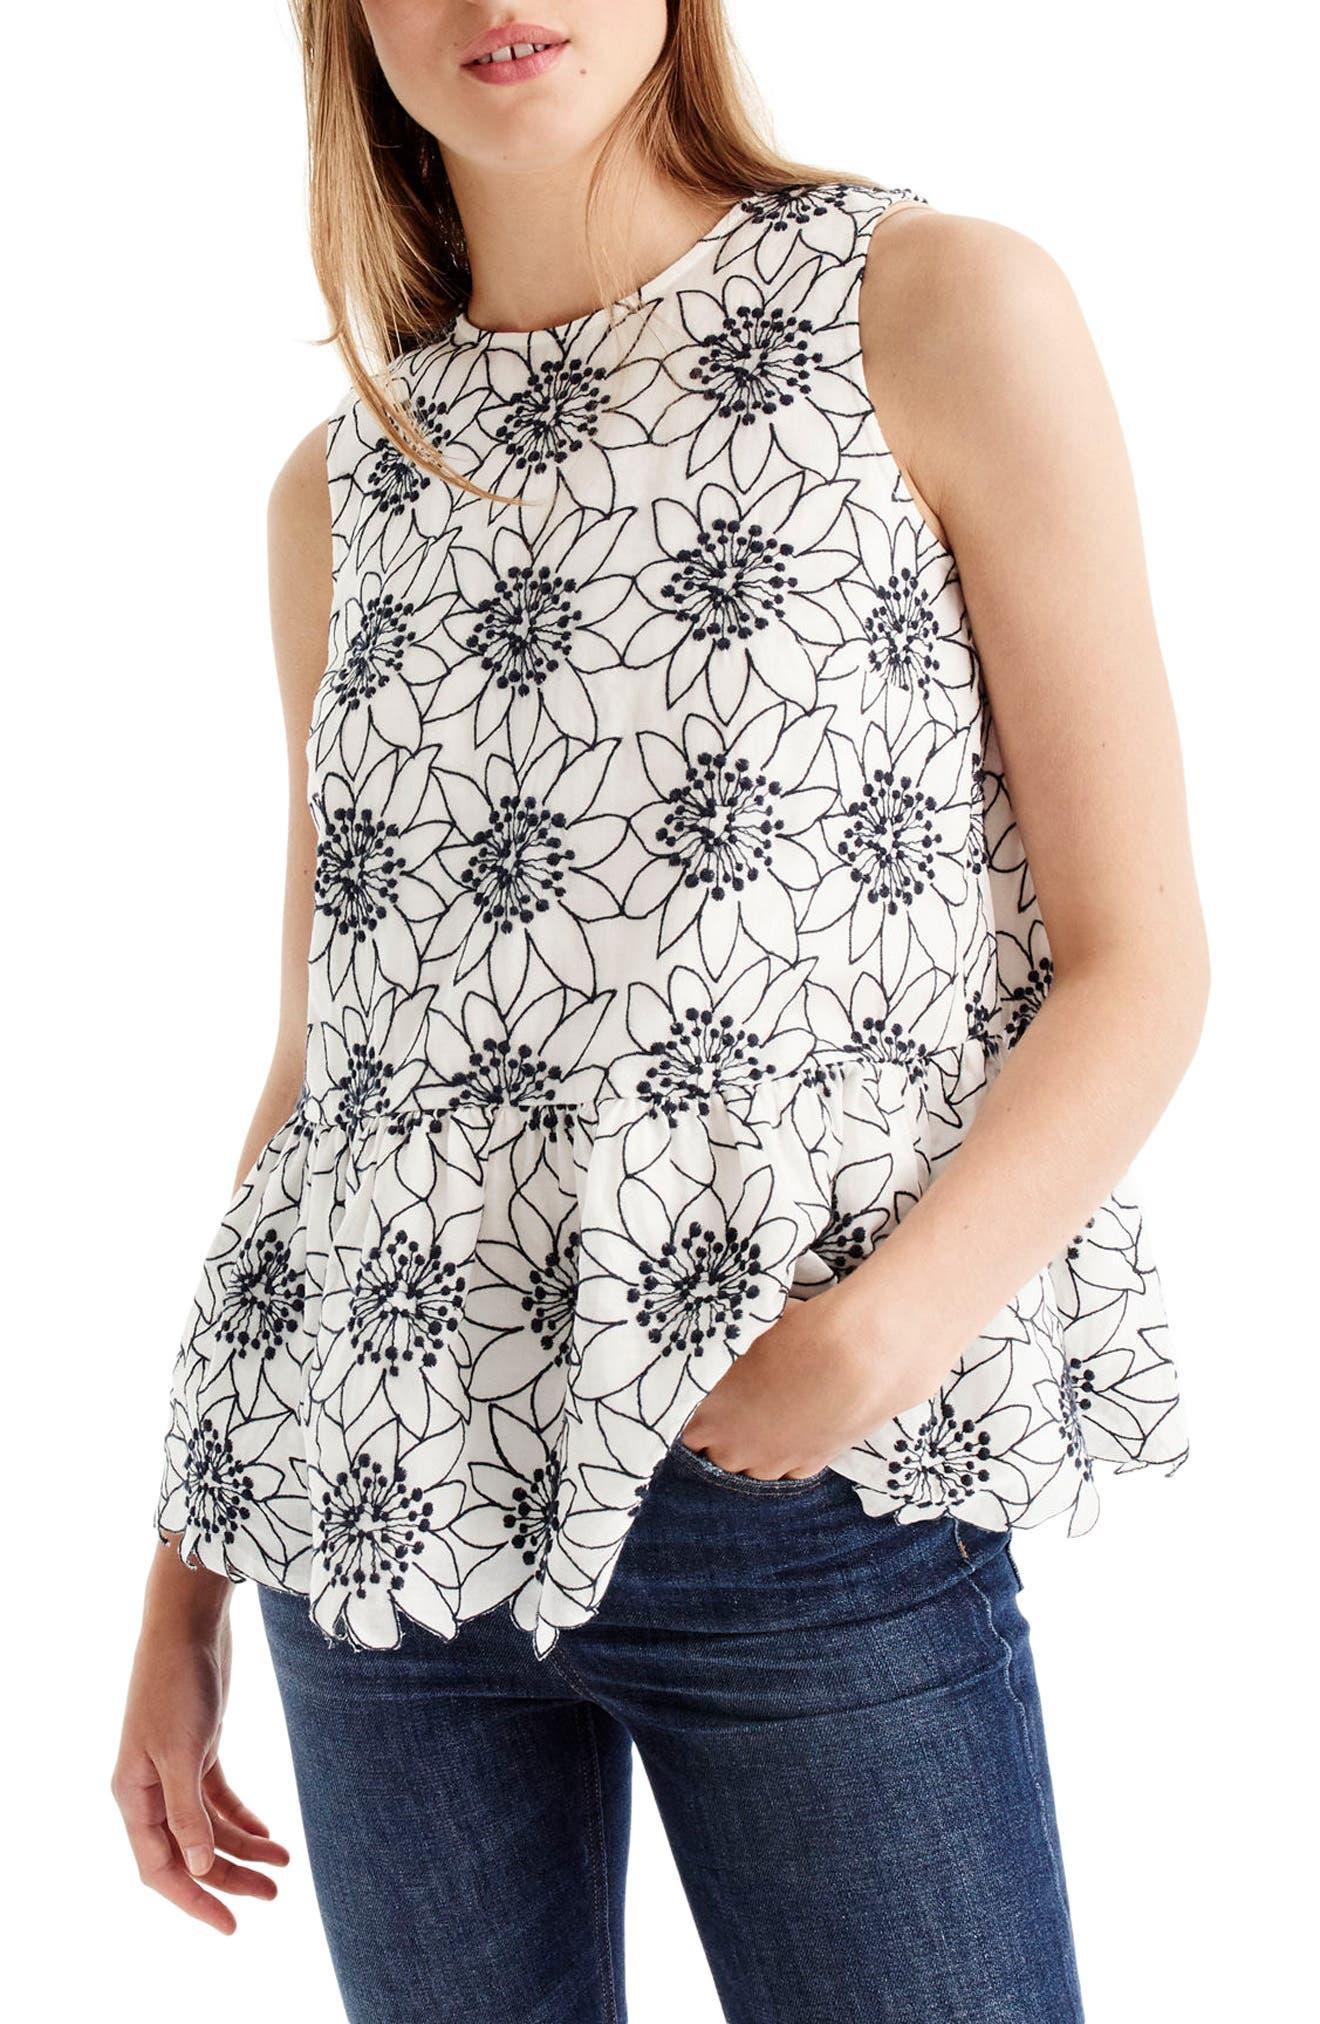 J.Crew Embroidered Floral Top (Regular & Petite)